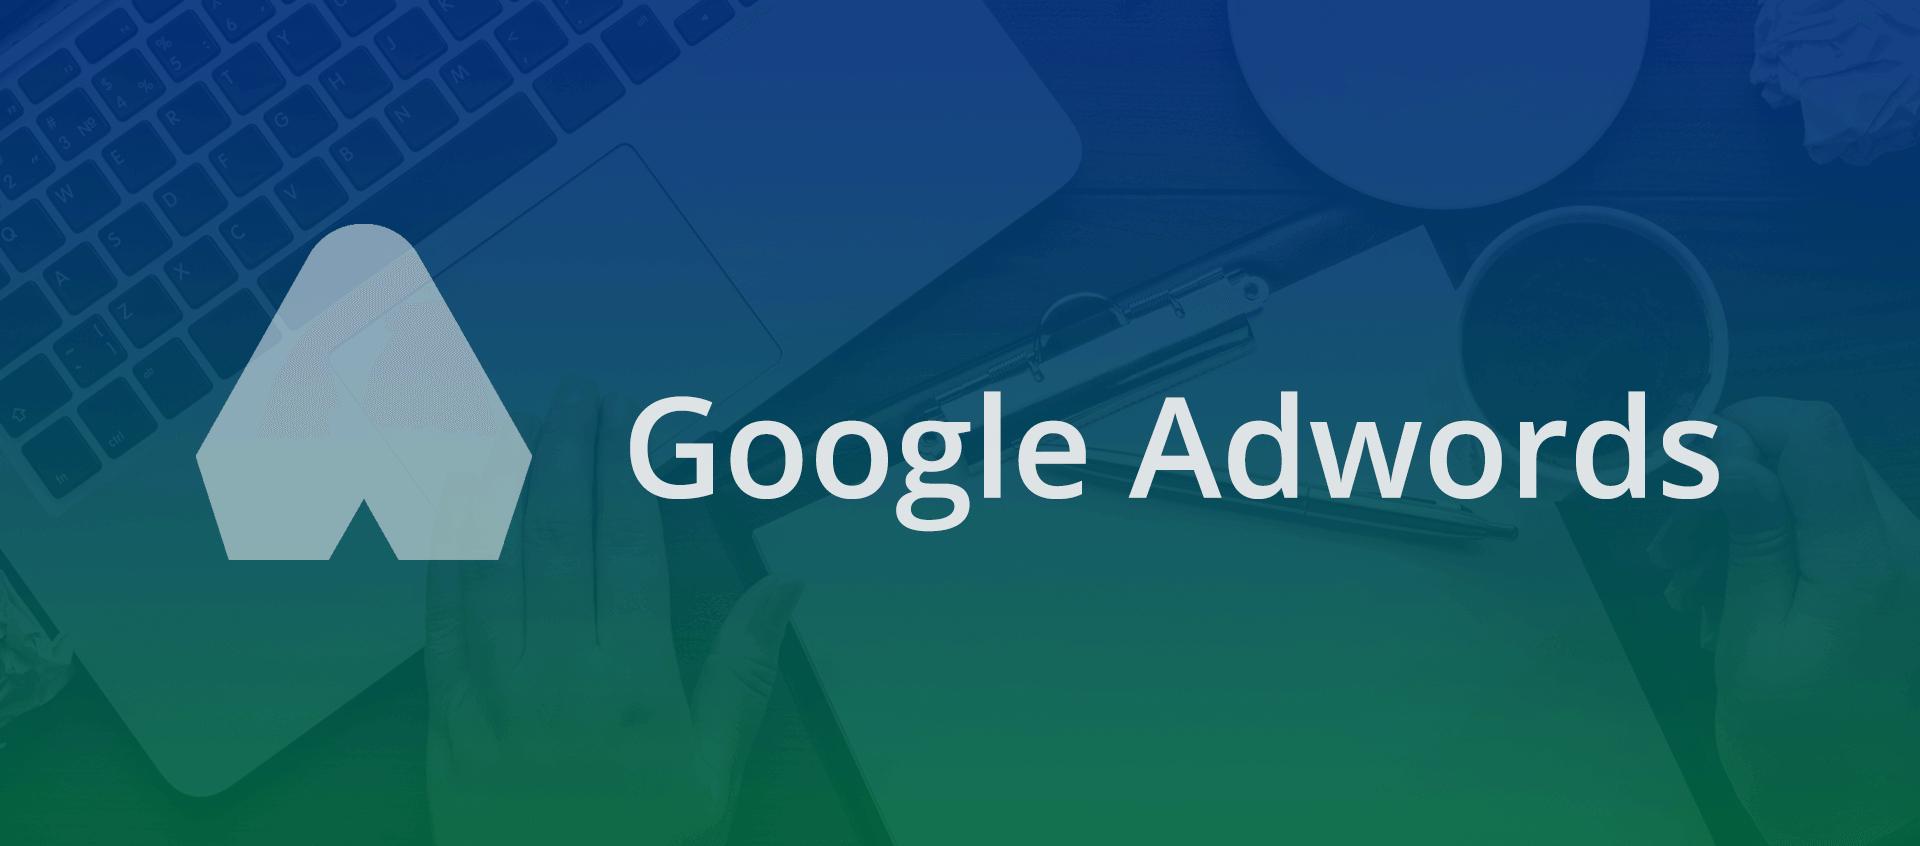 Google Adwords : 5 λόγοι να το χρησιμοποιήσετε